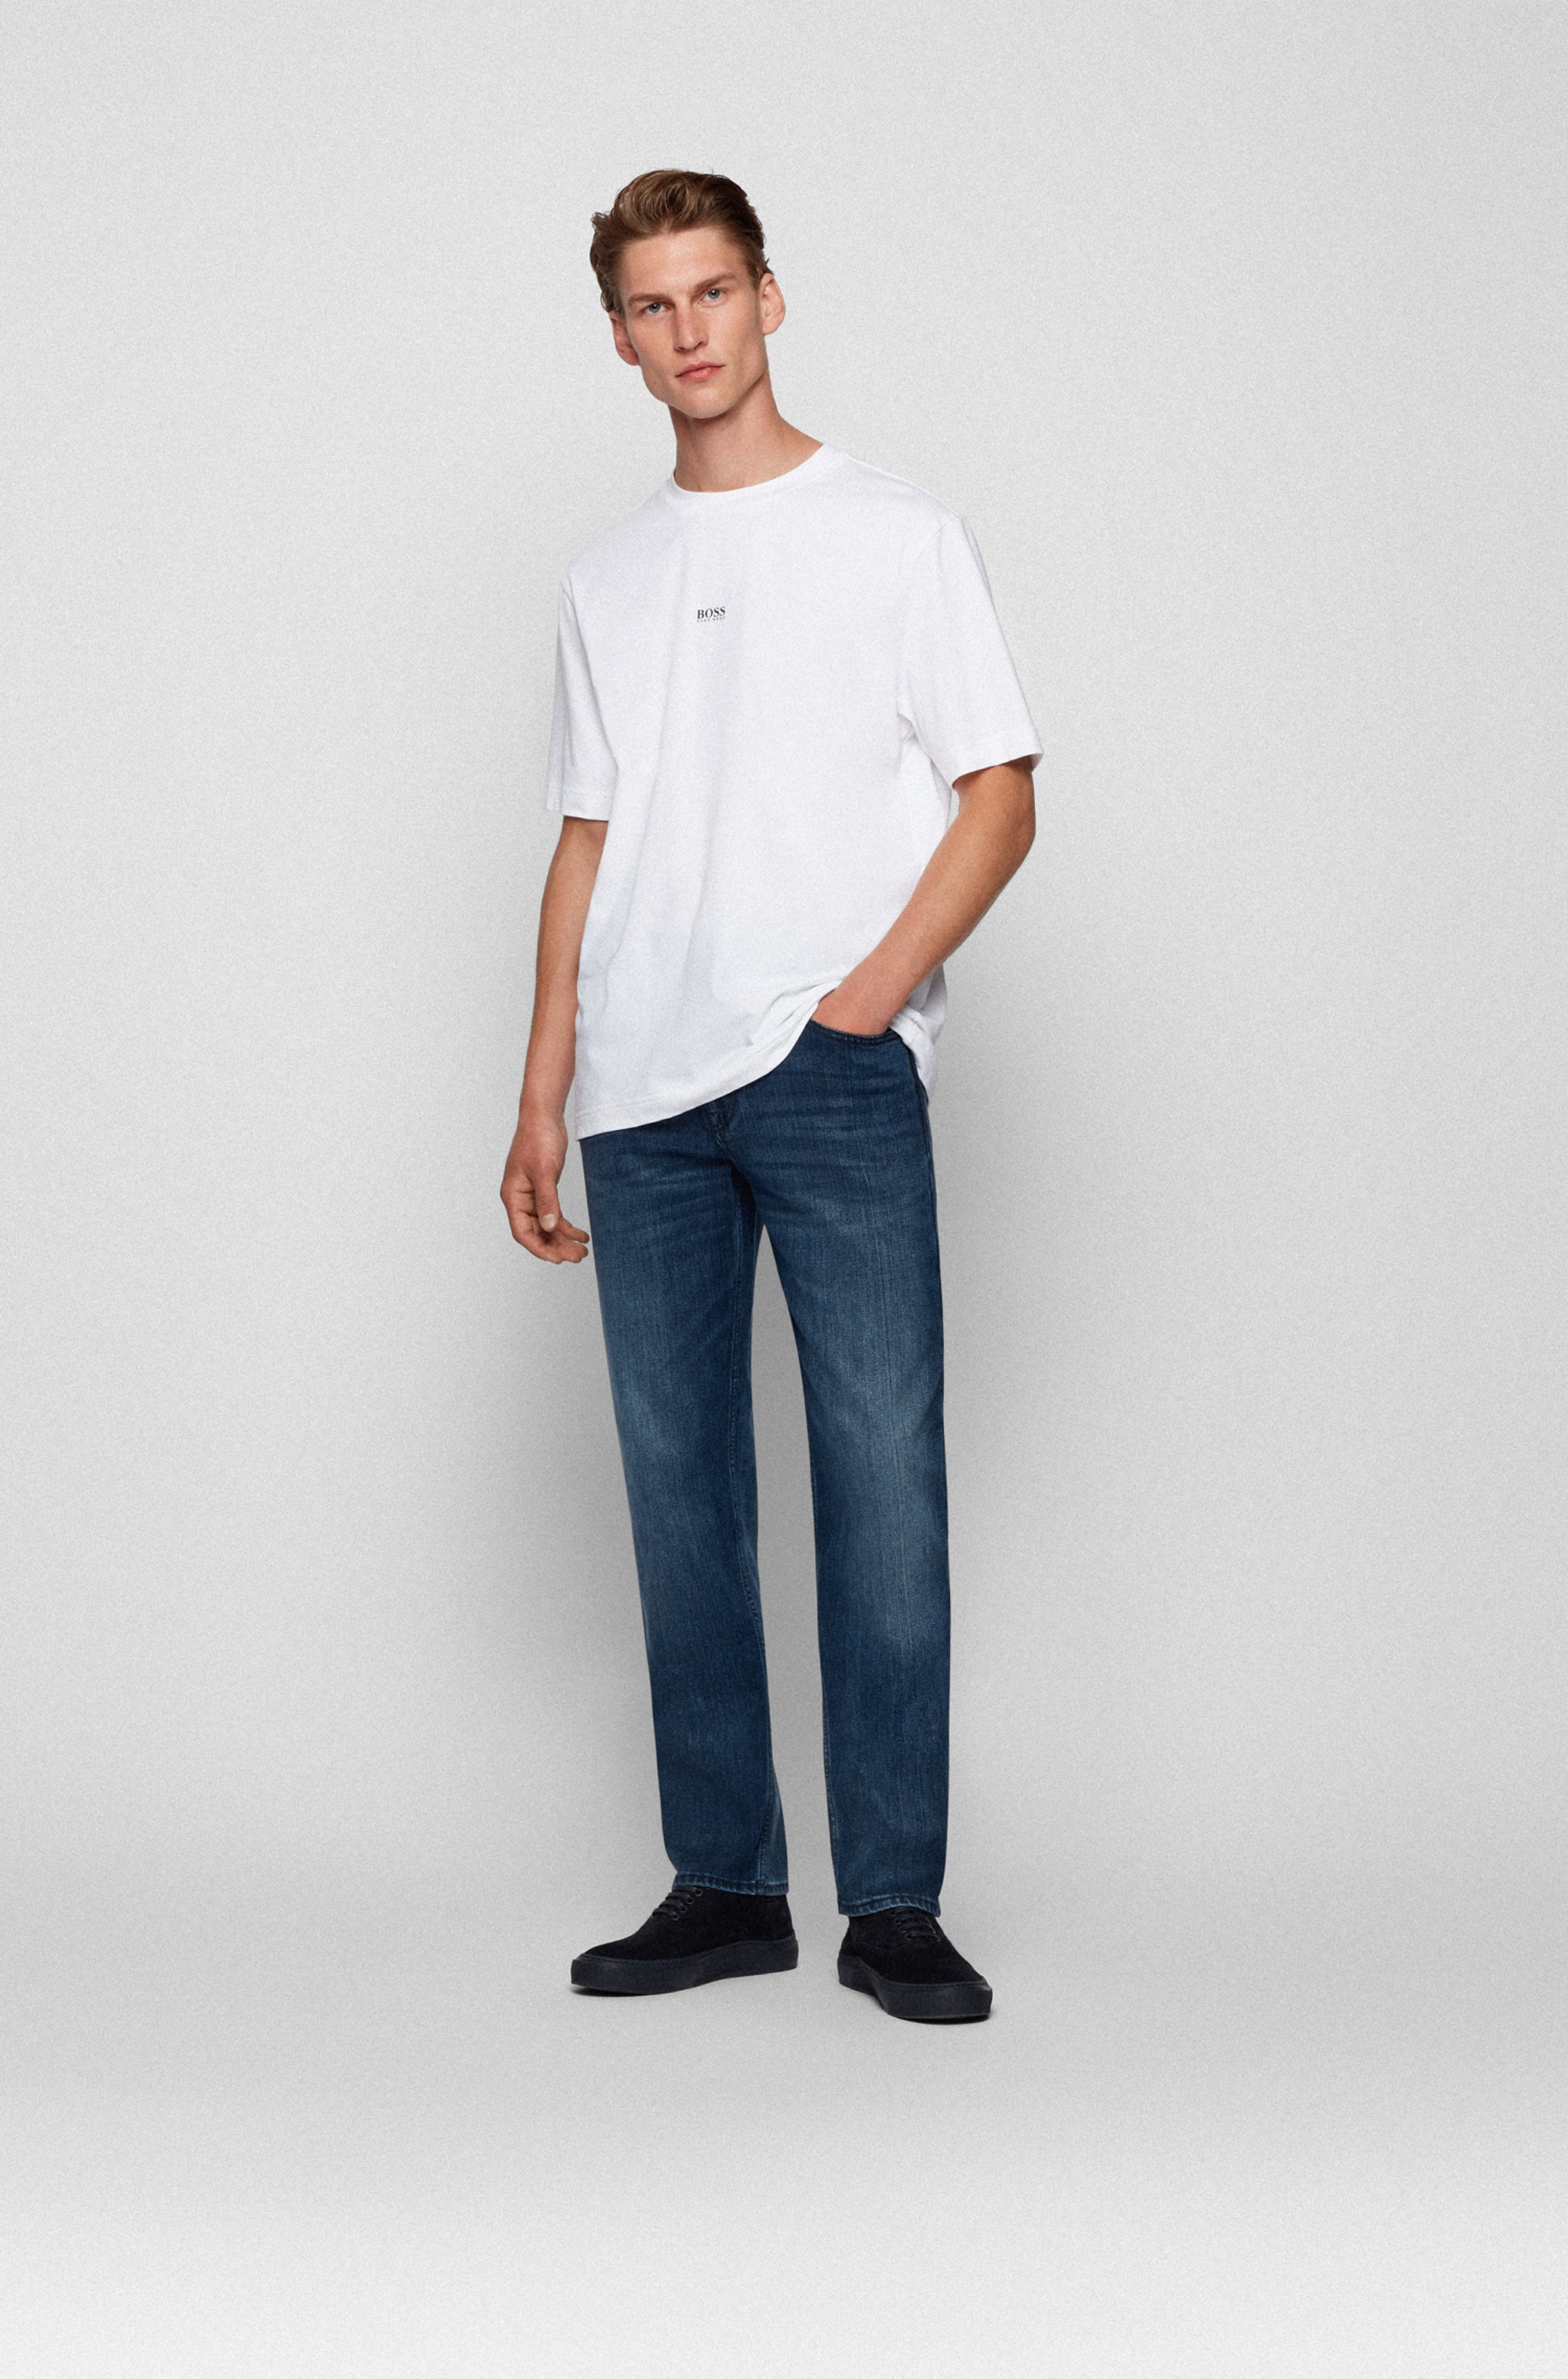 Blauschwarze Relaxed-Fit Jeans aus komfortablem Stretch-Denim